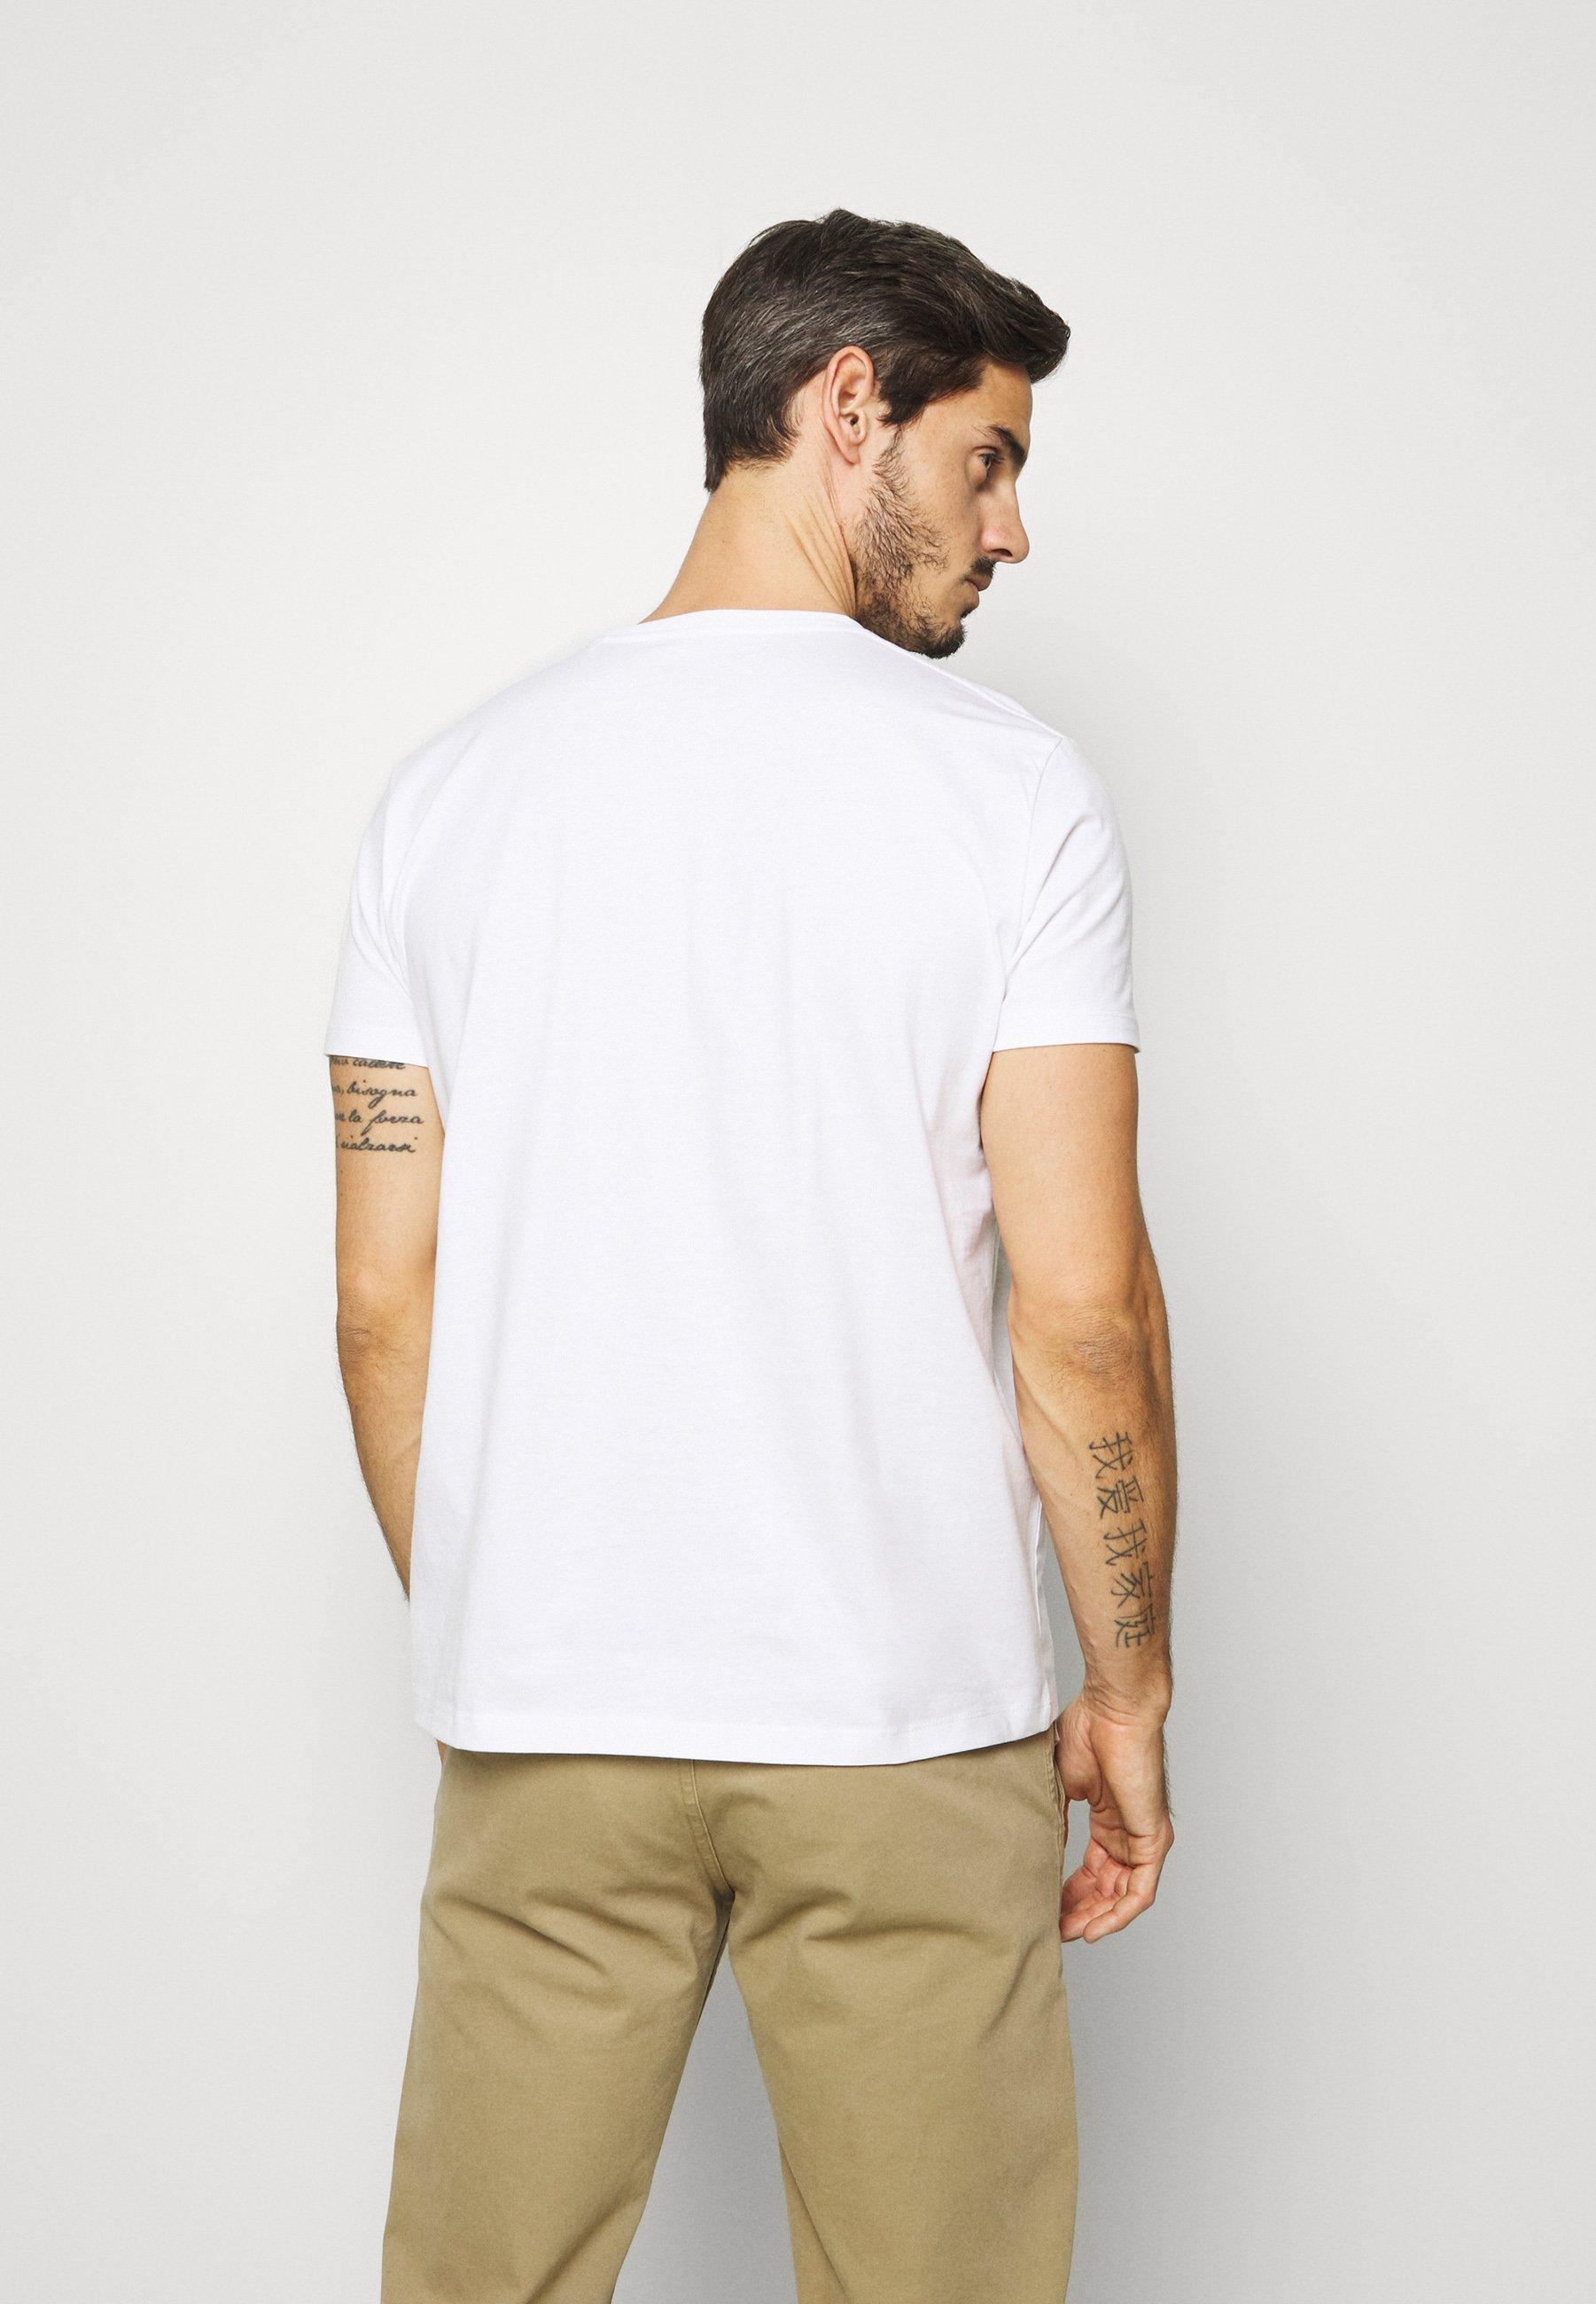 Esprit Print T-shirt - white yMV2M